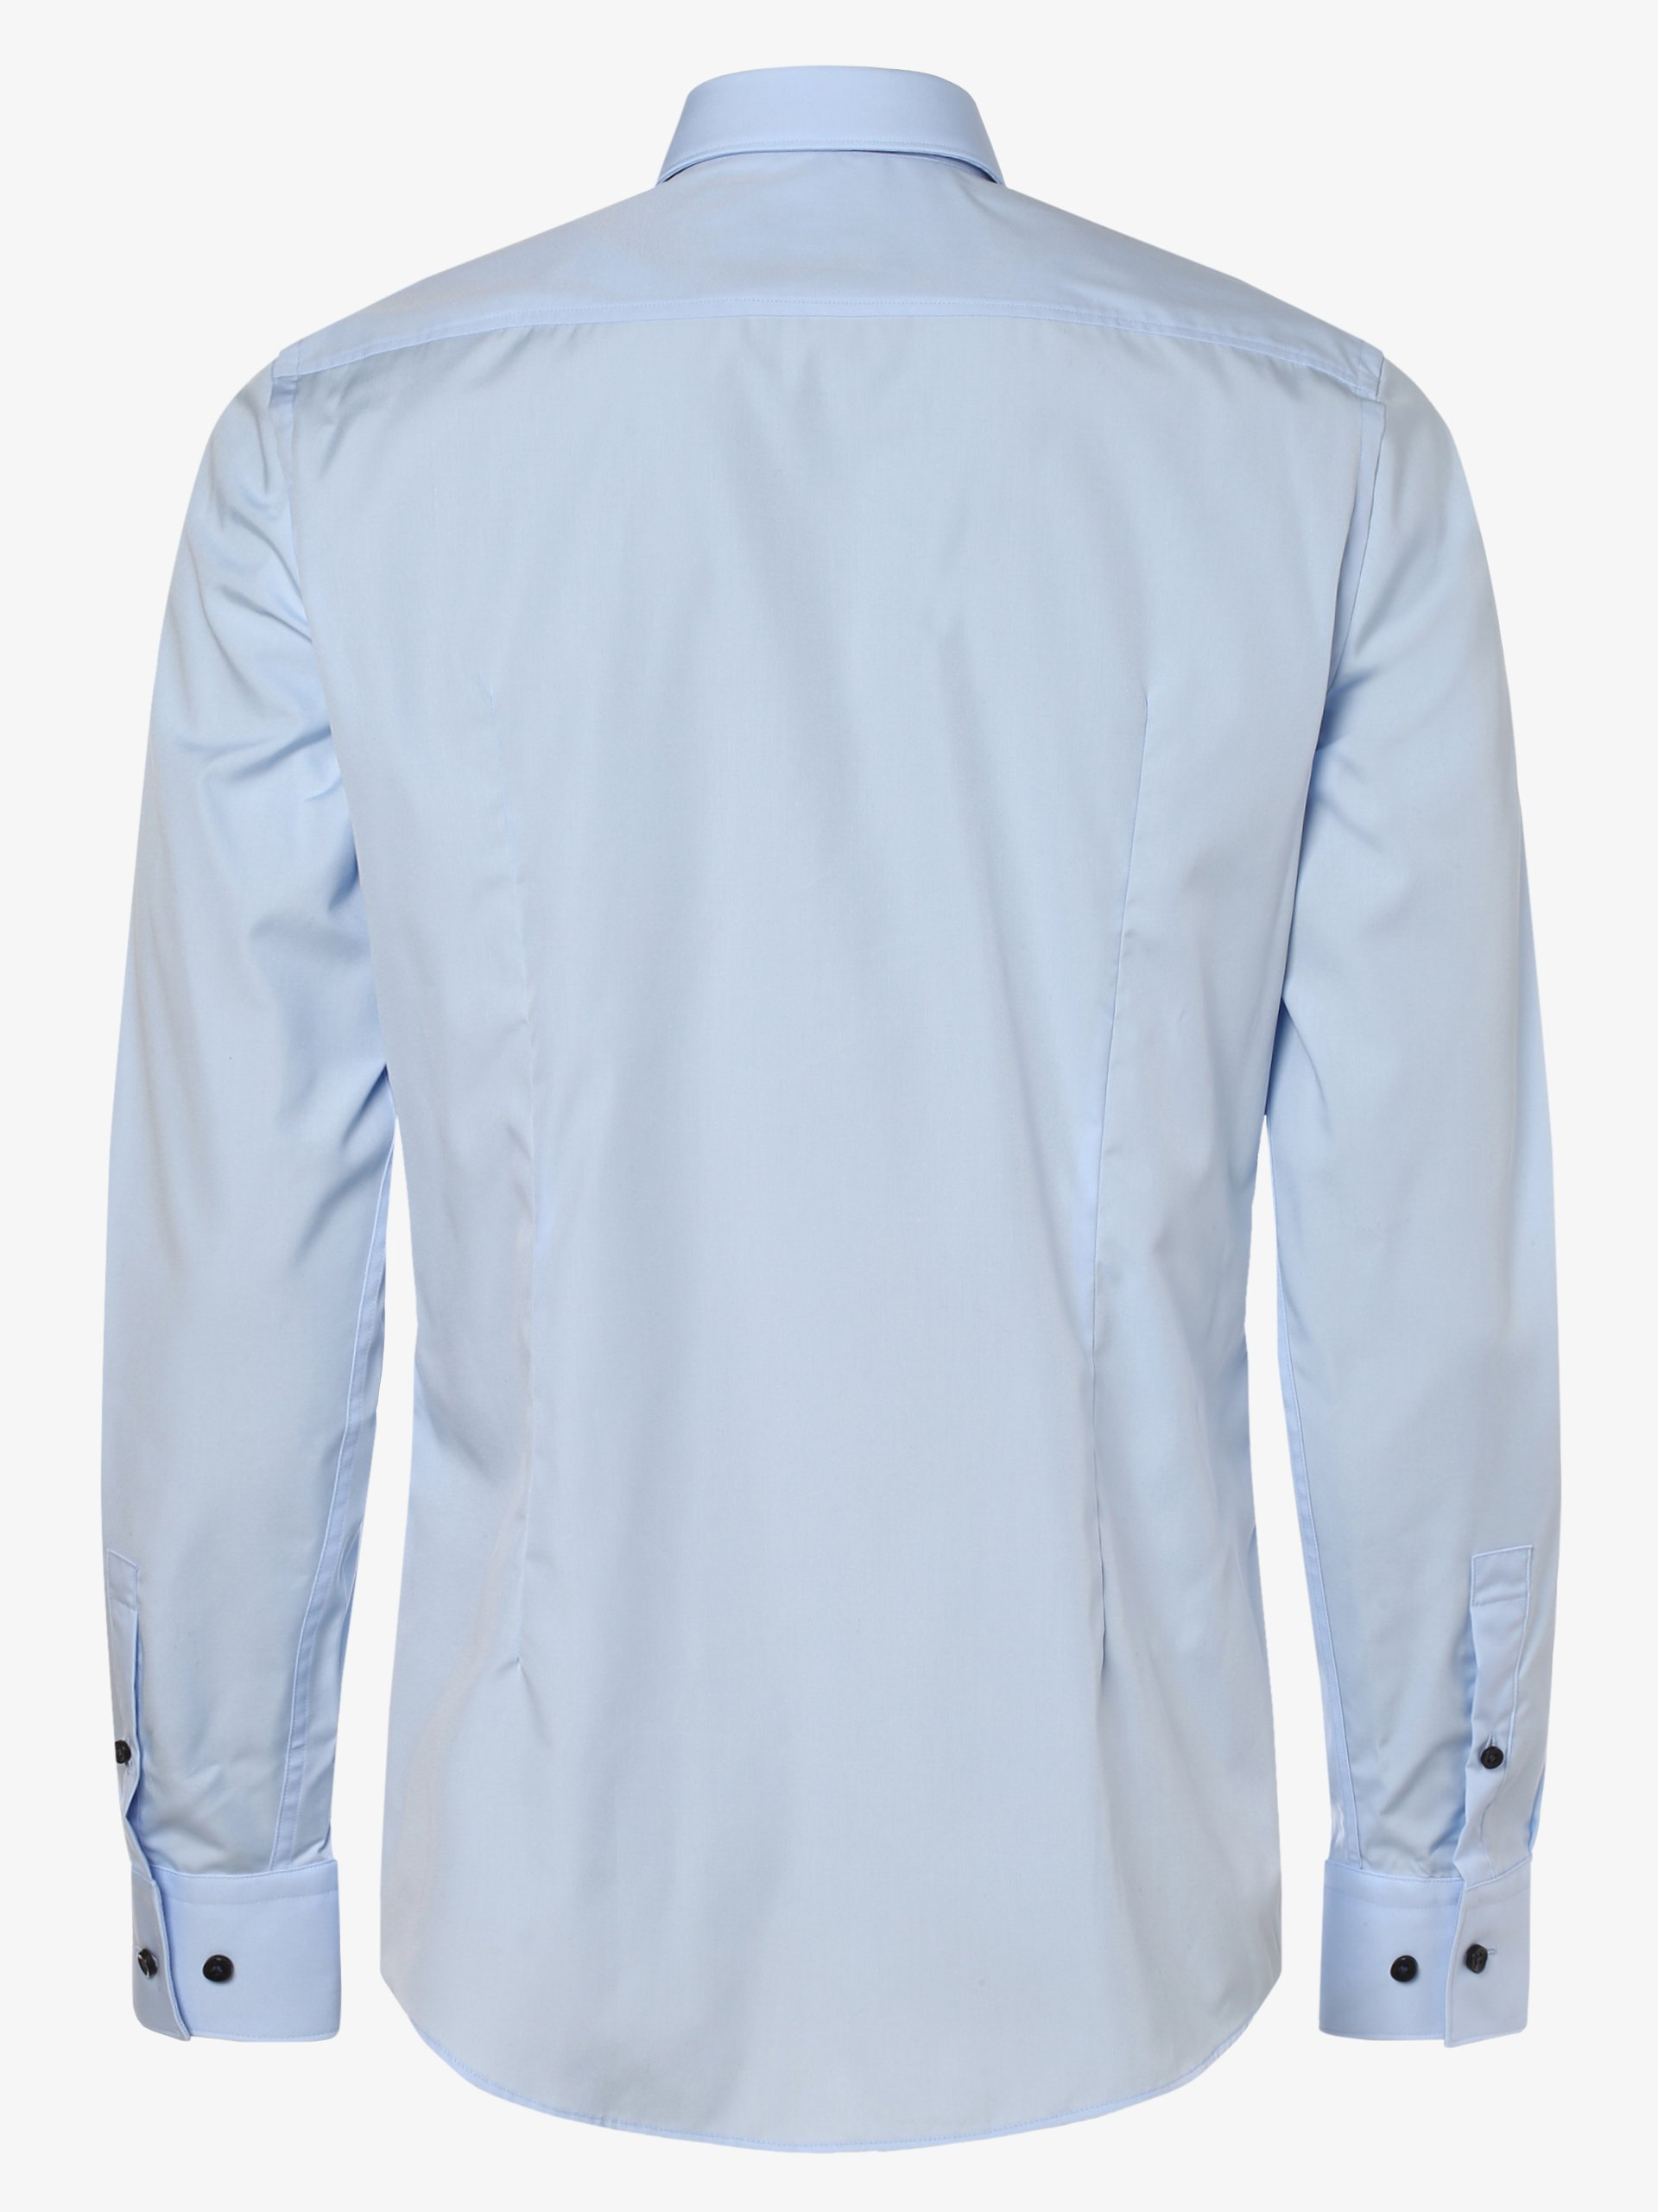 BOSS Herren Hemd - Bügelleicht - Jano